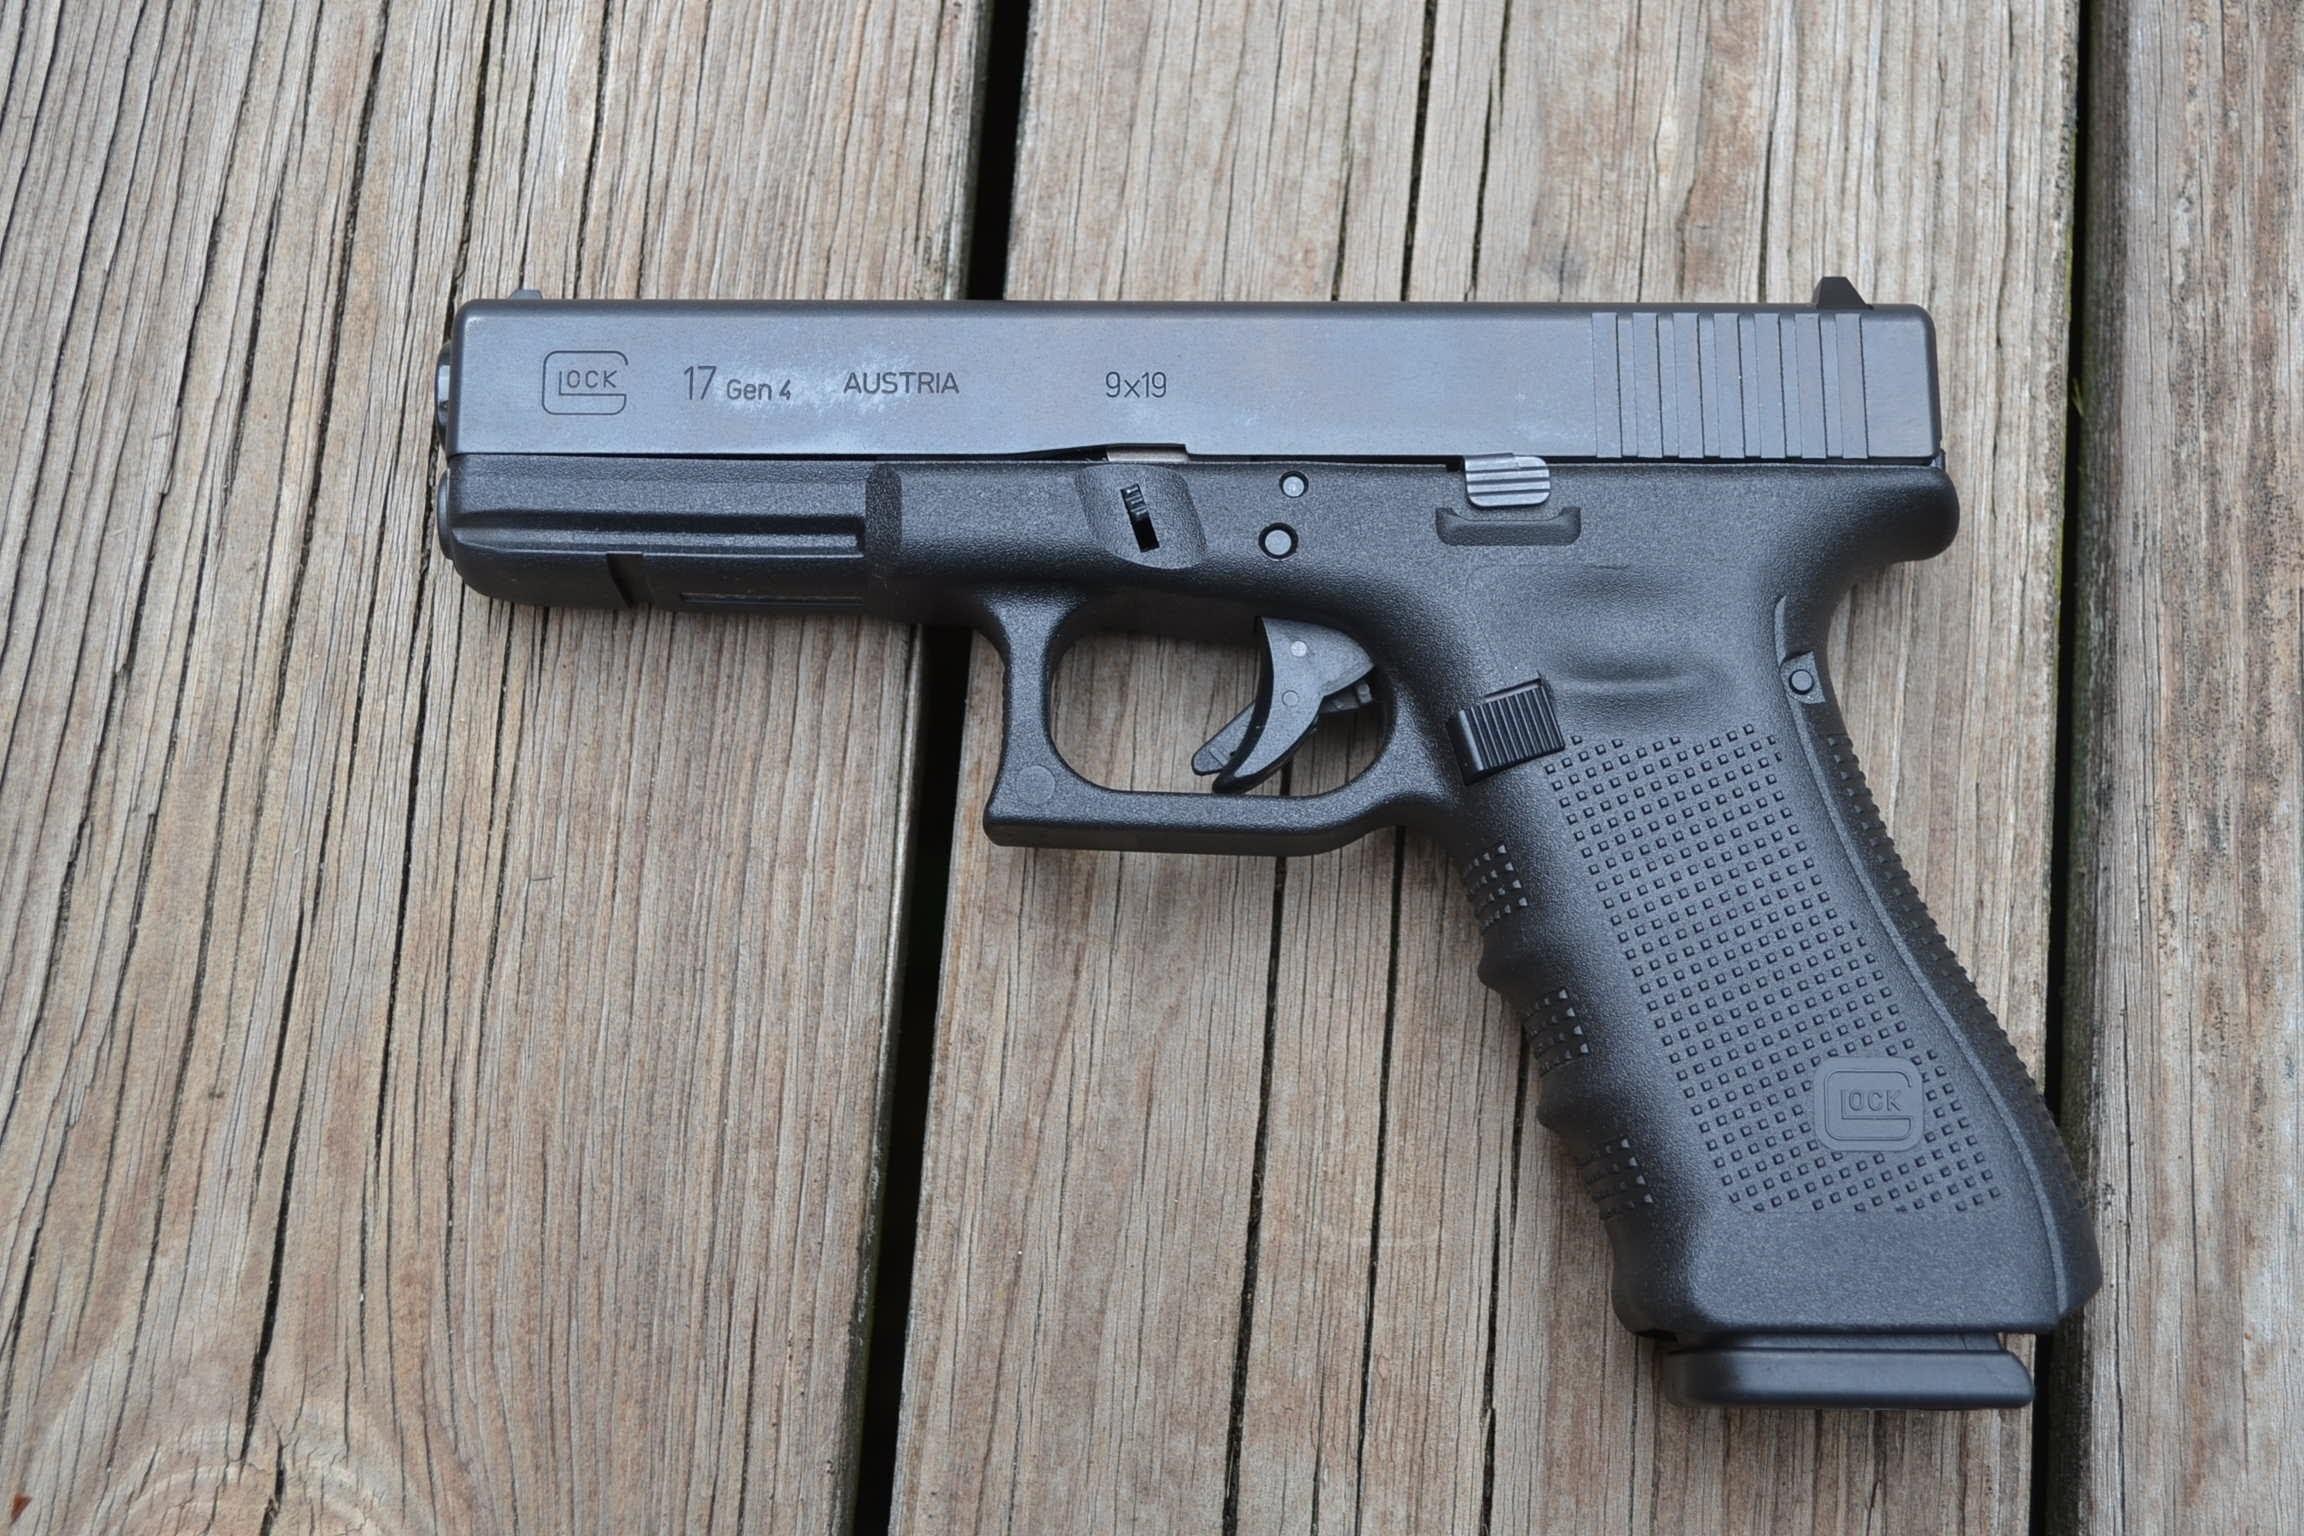 Glock 17 Gen 4 Wallpaper ·① WallpaperTag